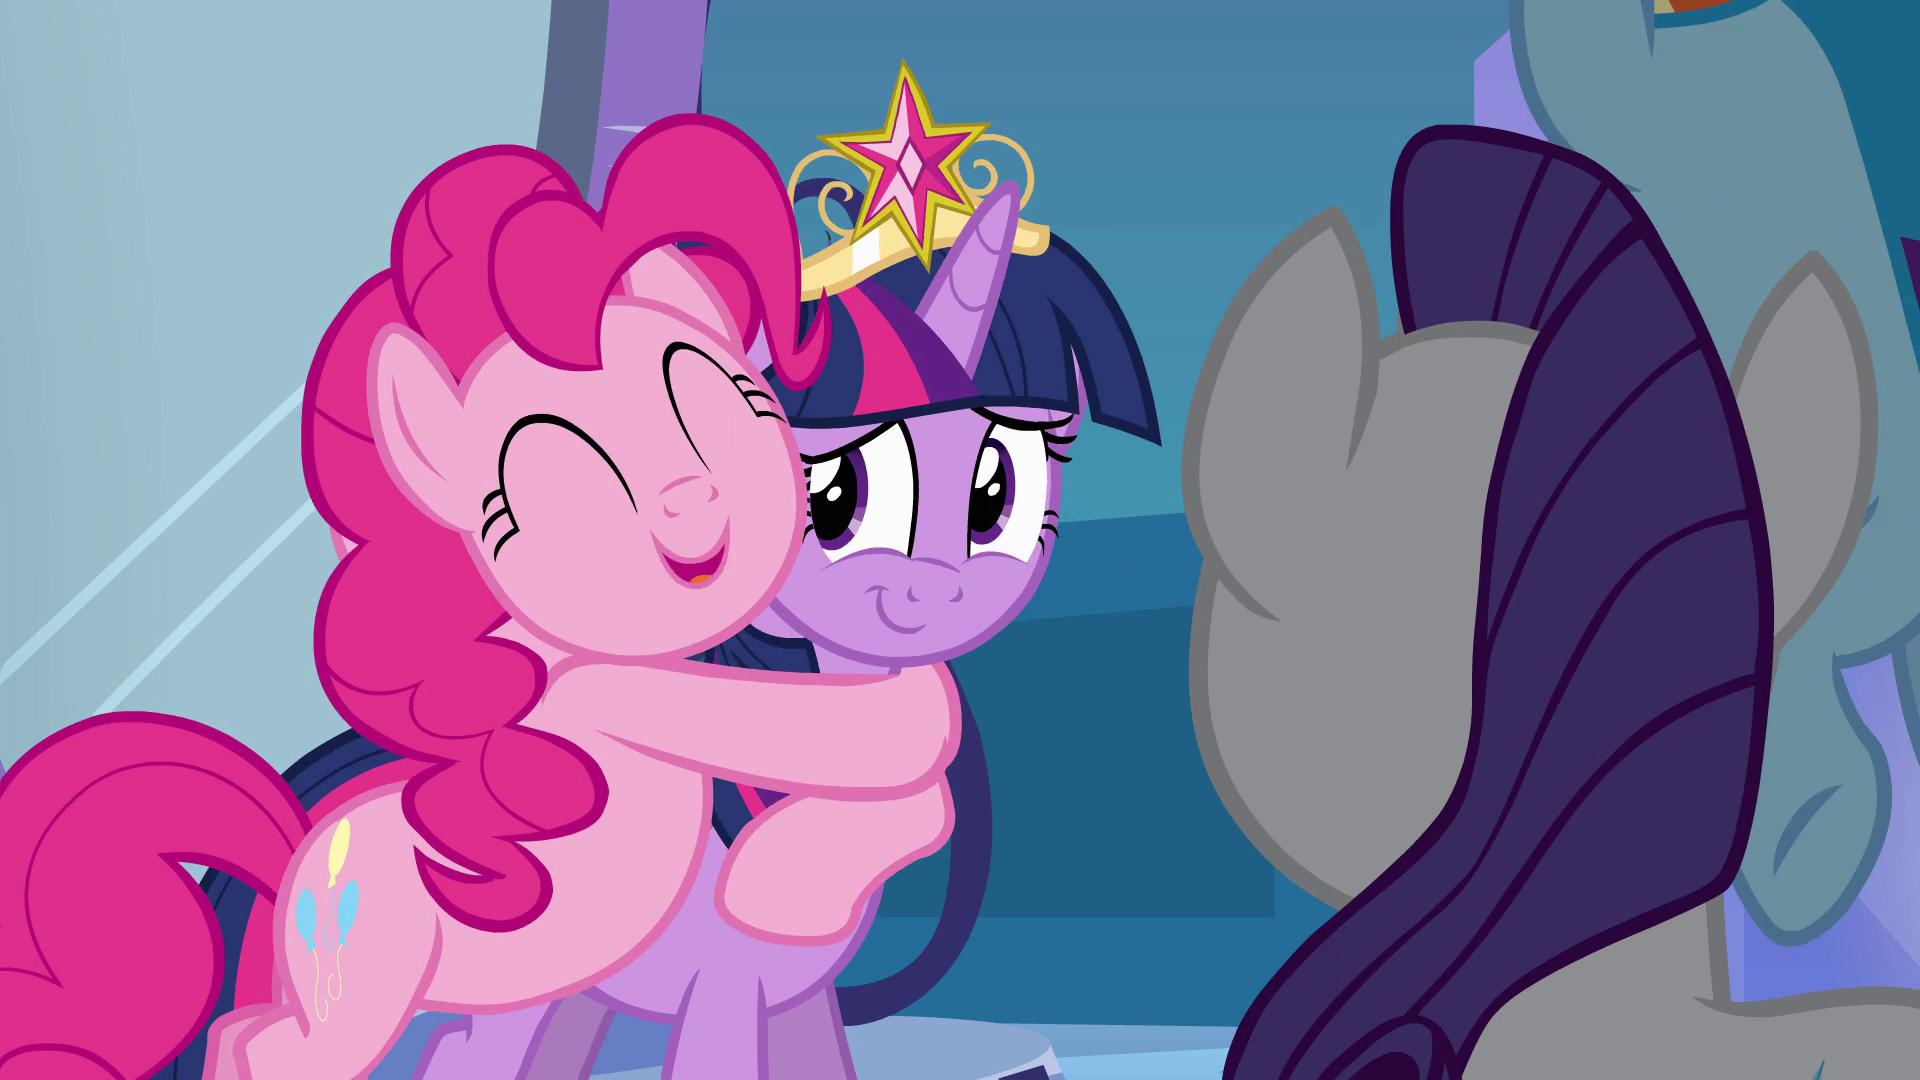 Pinkie_Pie_hugging_Twilight_EG.png